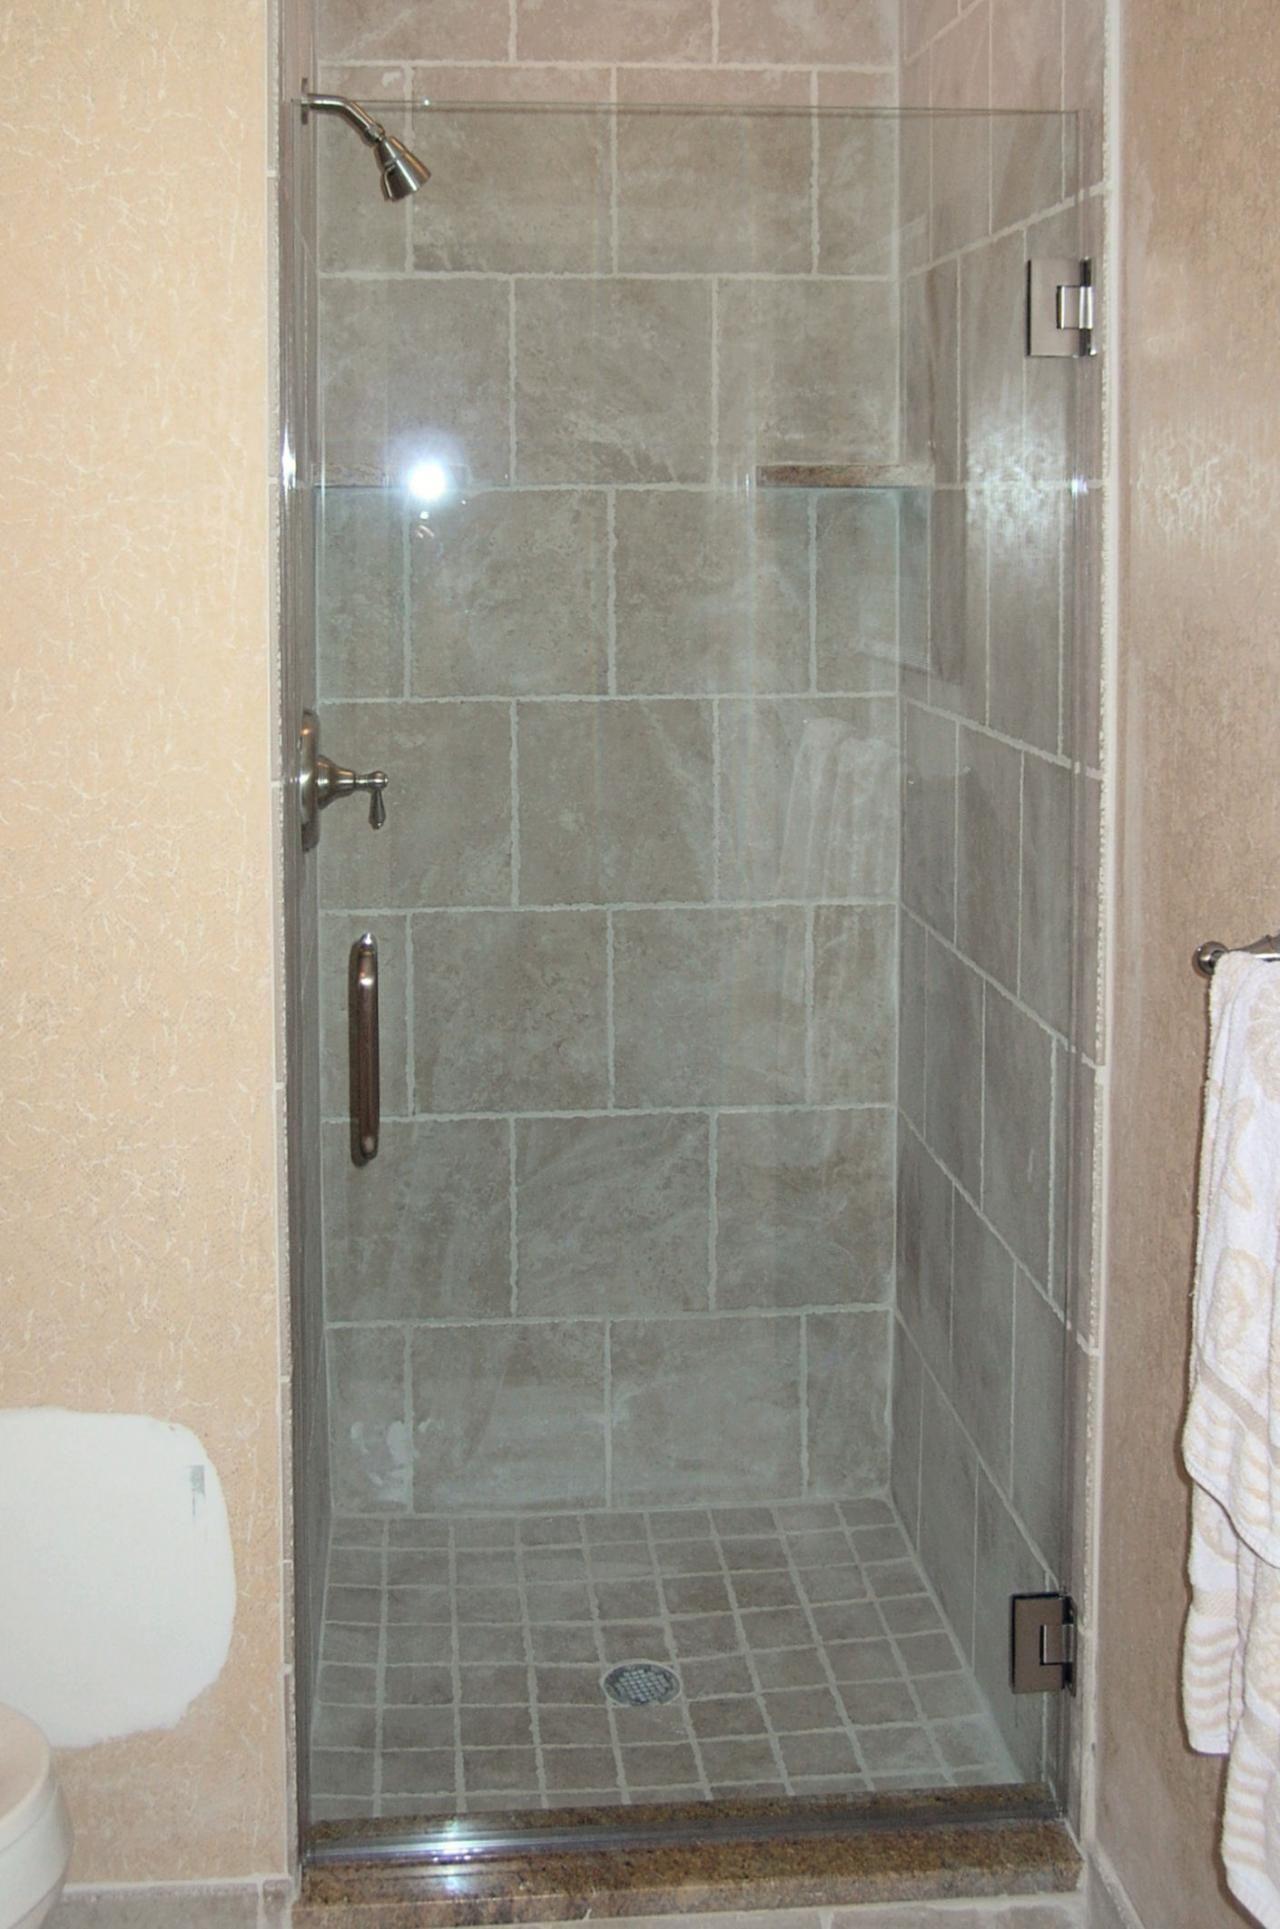 Single panel glass shower doors glass doors pinterest shower single panel glass shower doors planetlyrics Choice Image